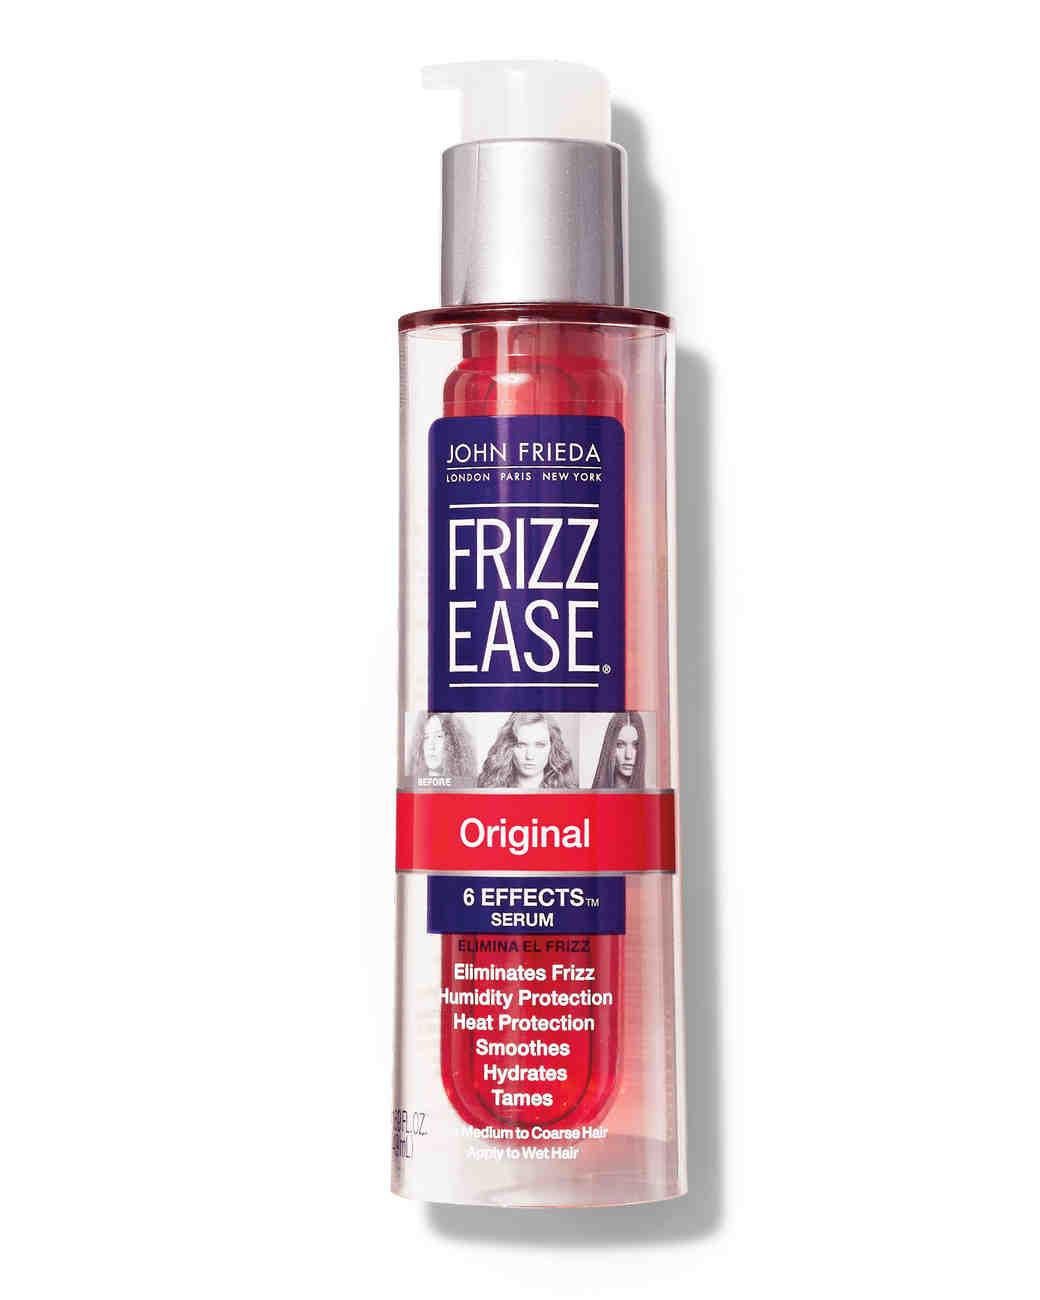 frizz-ease-1-164-d111715.jpg